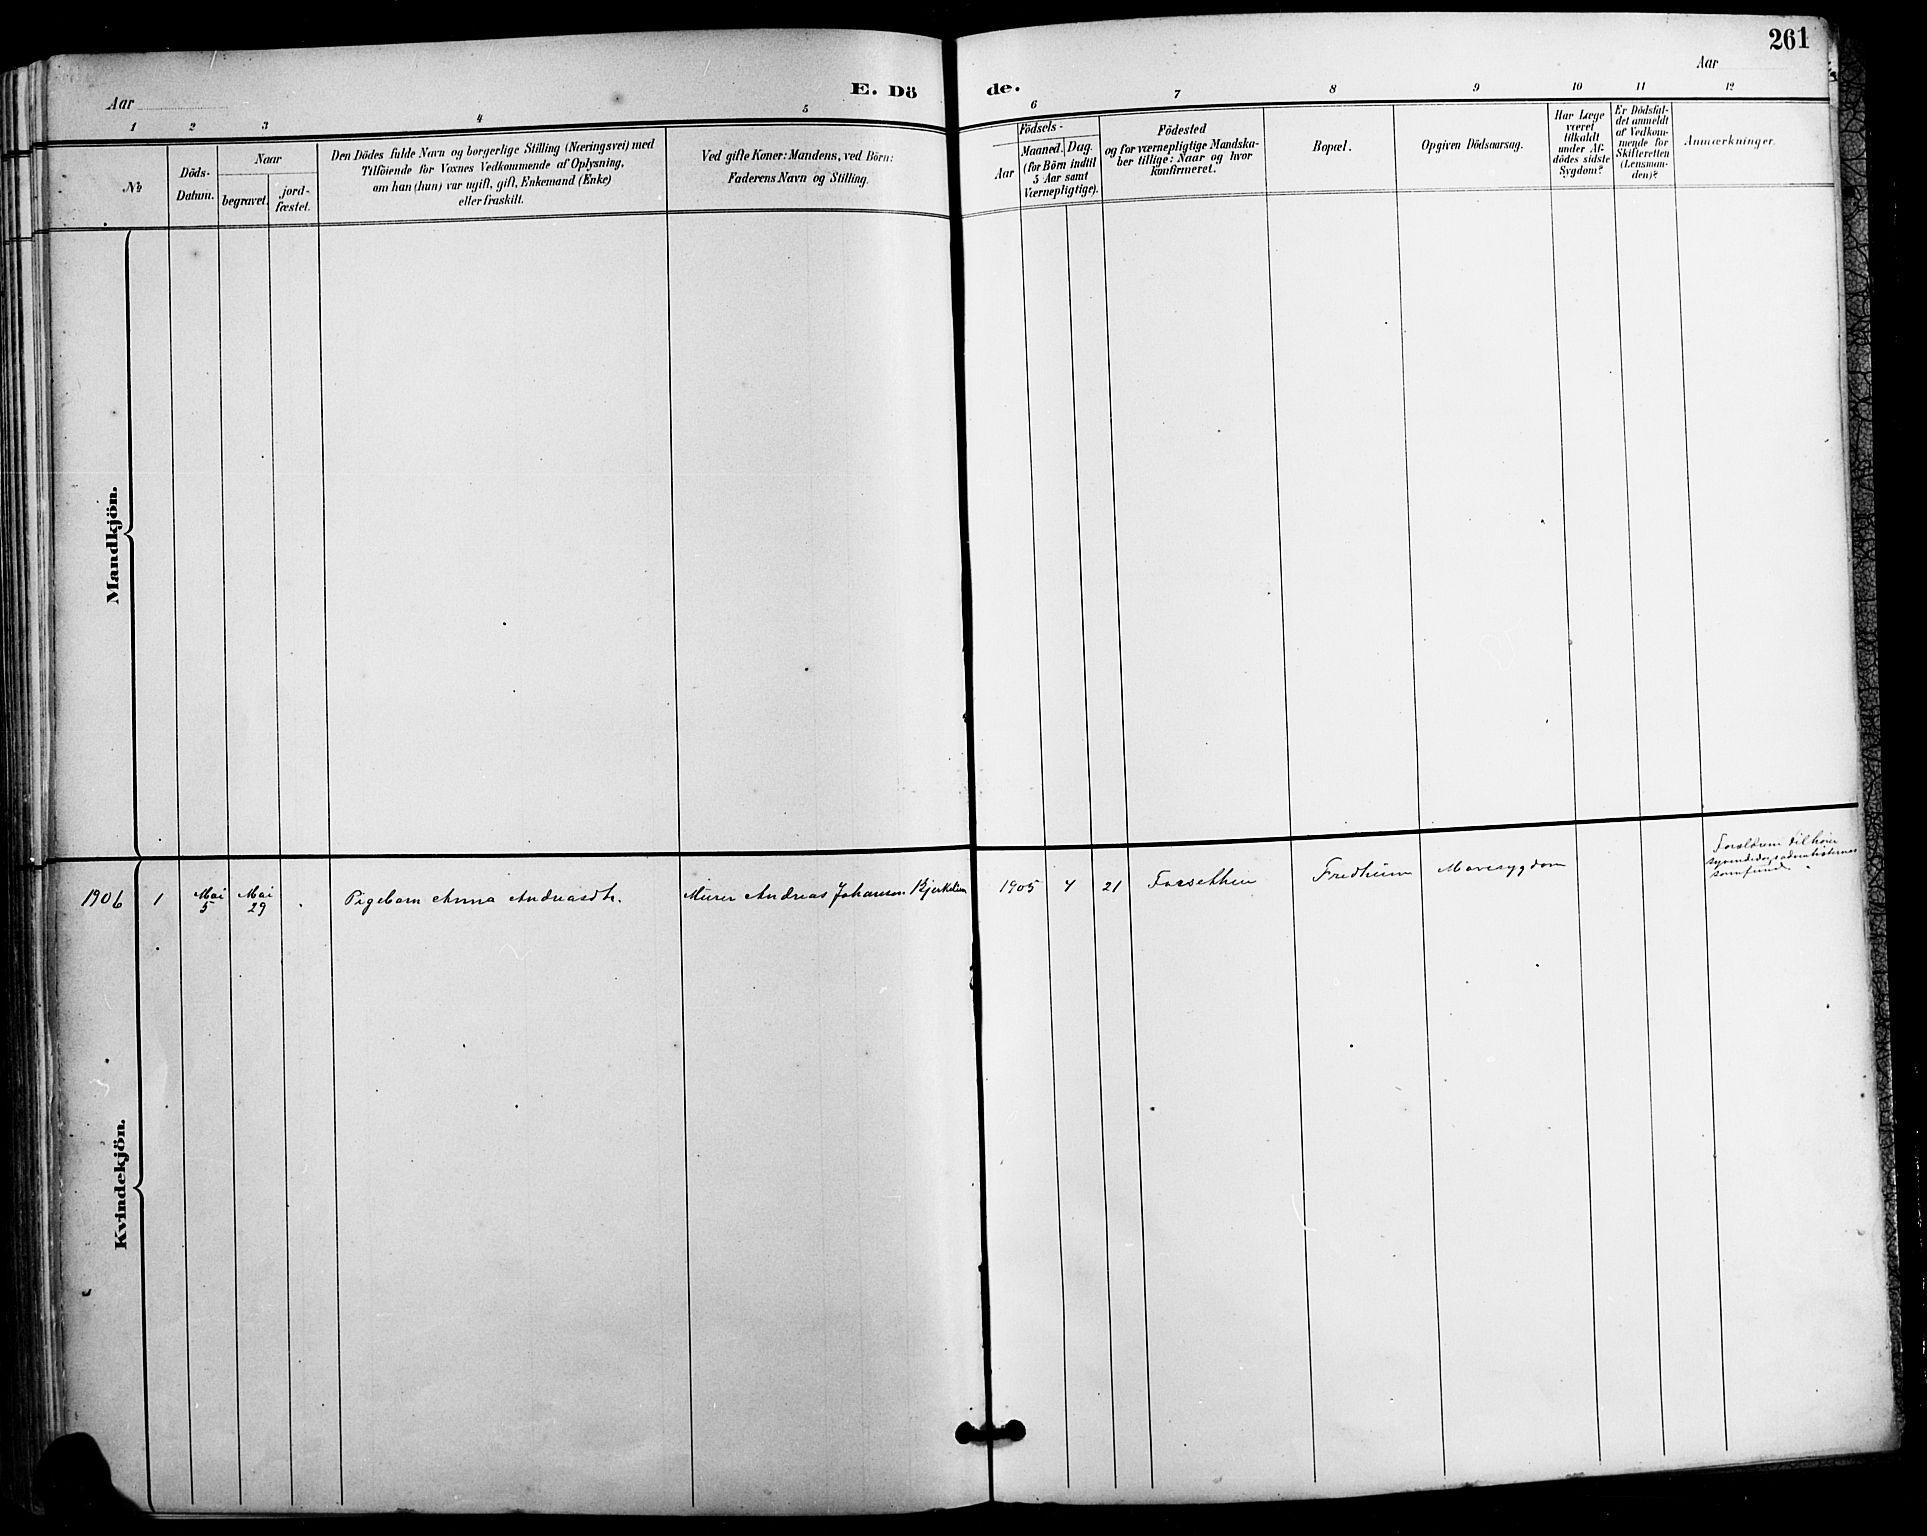 SAH, Vestre Gausdal prestekontor, Klokkerbok nr. 3, 1896-1925, s. 261